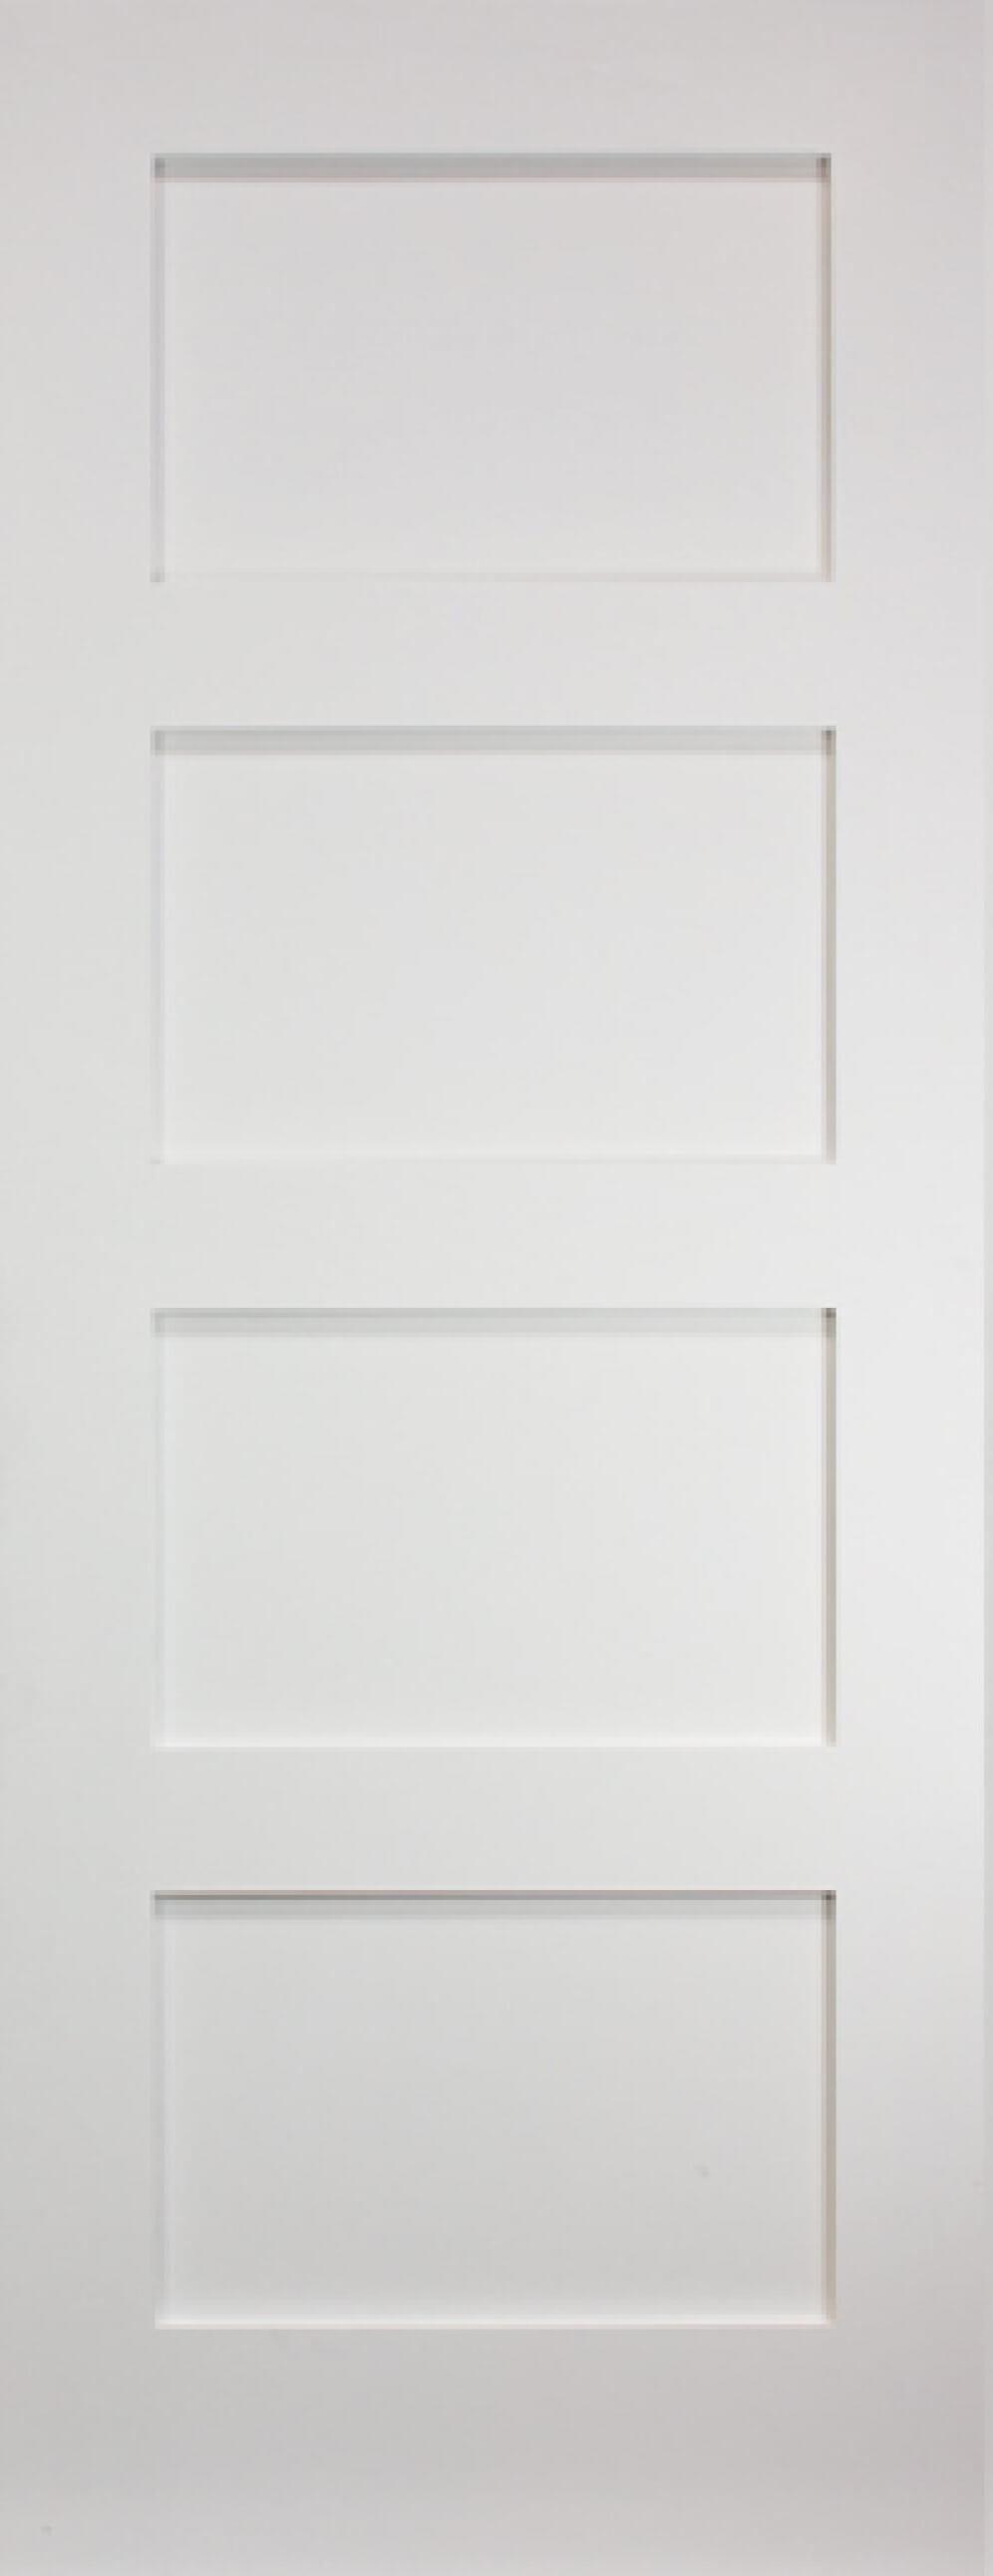 Coventry White 4 Panel Shaker Image